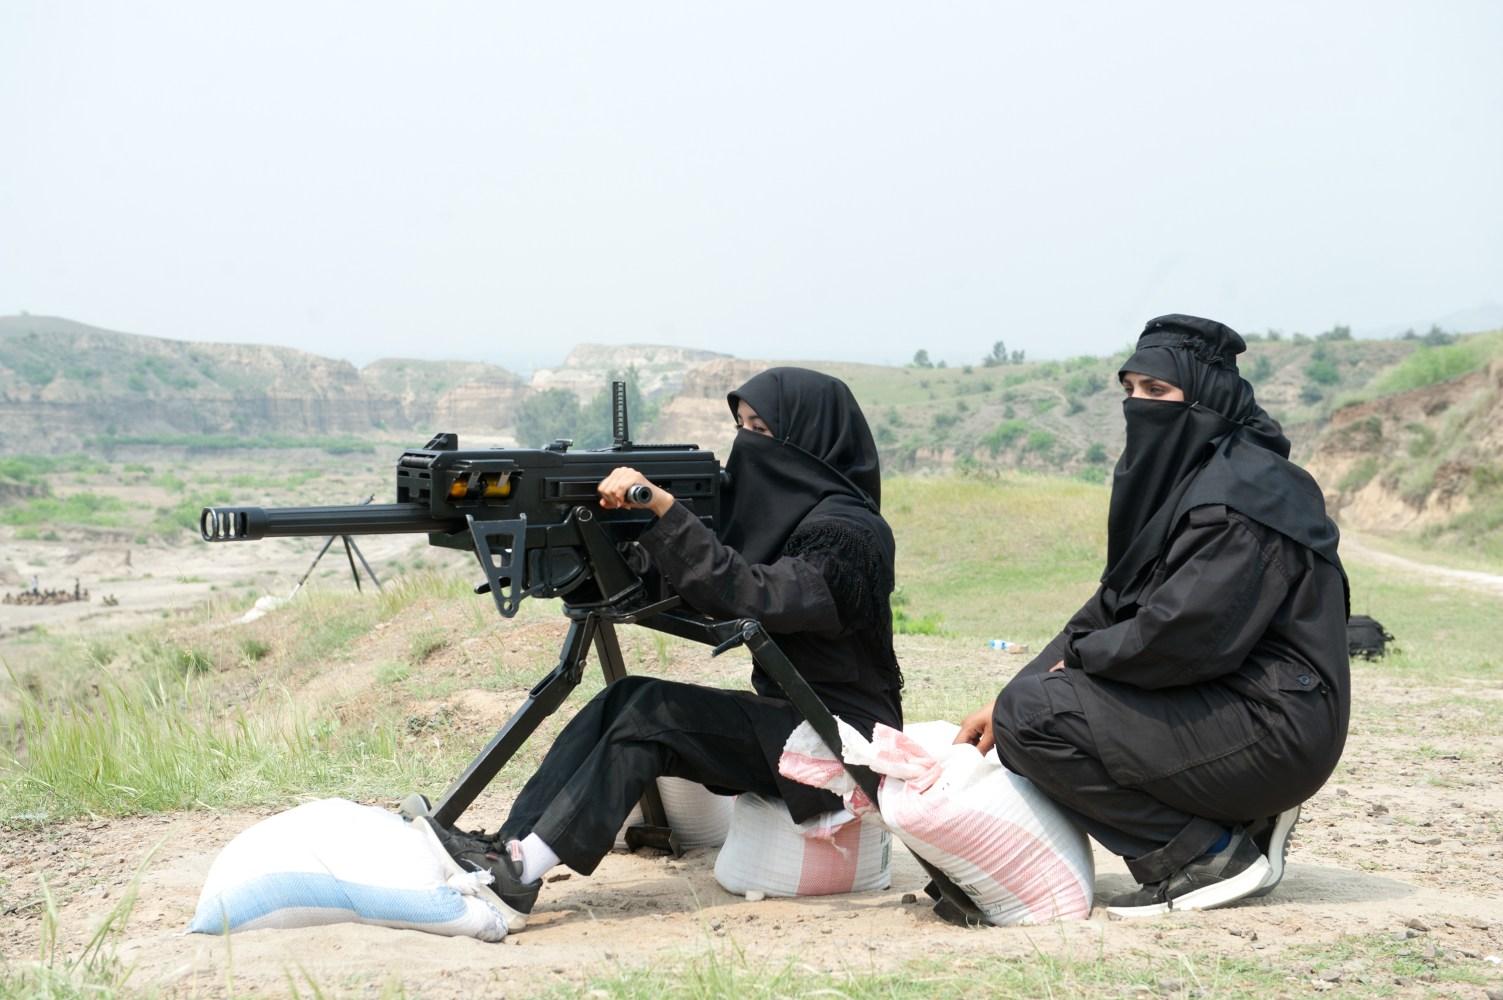 Taliban Pakistan 2015 Pakistan April 15 2015